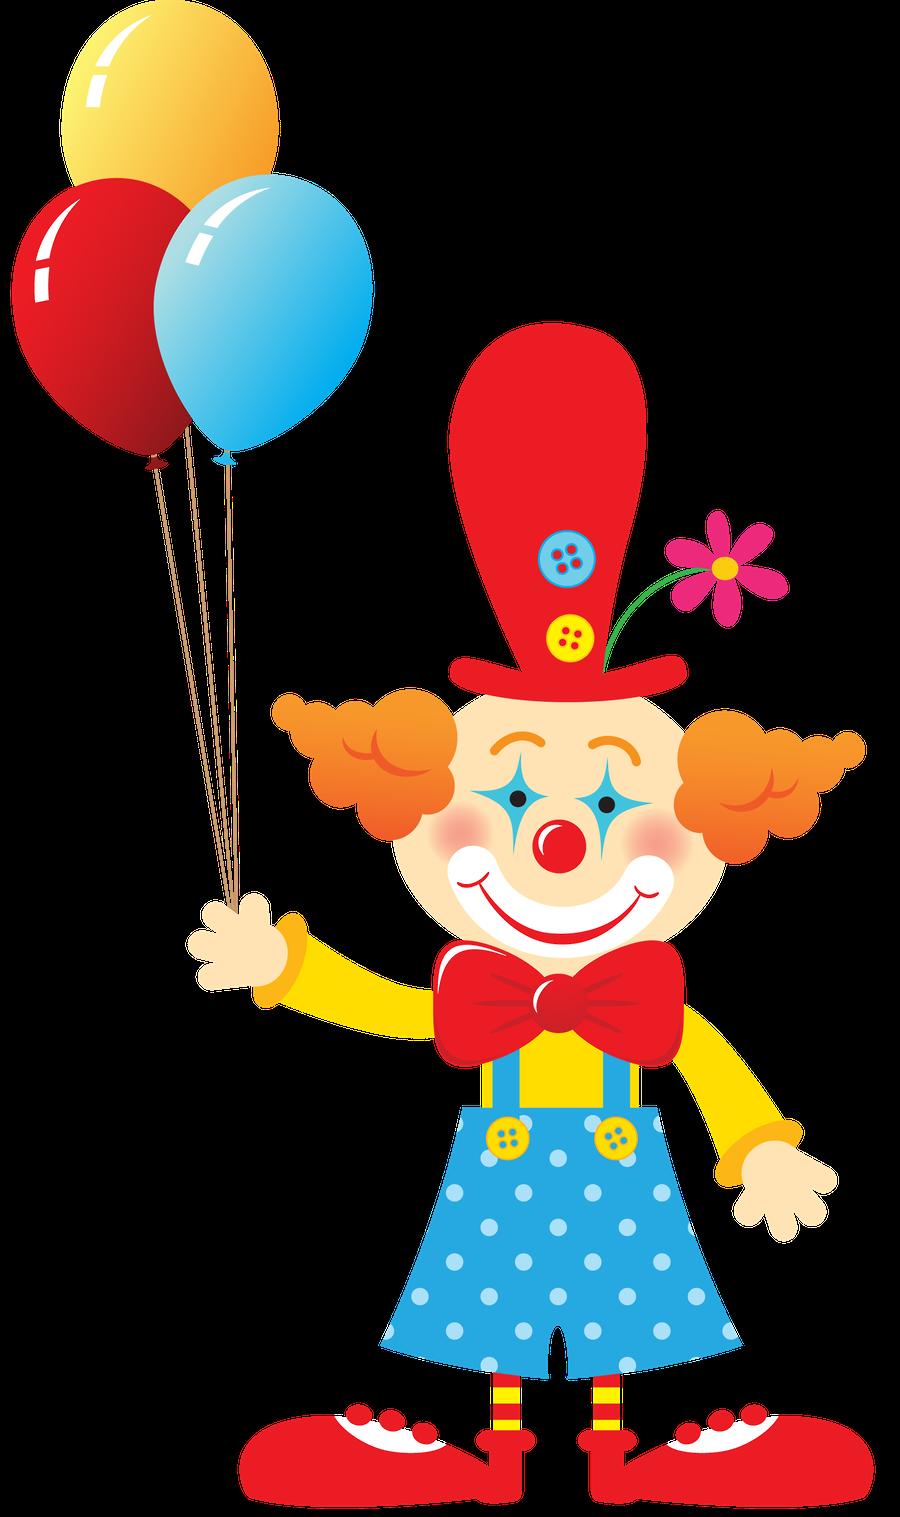 Http selmabuenoaltran minus com. Tickets clipart balloon